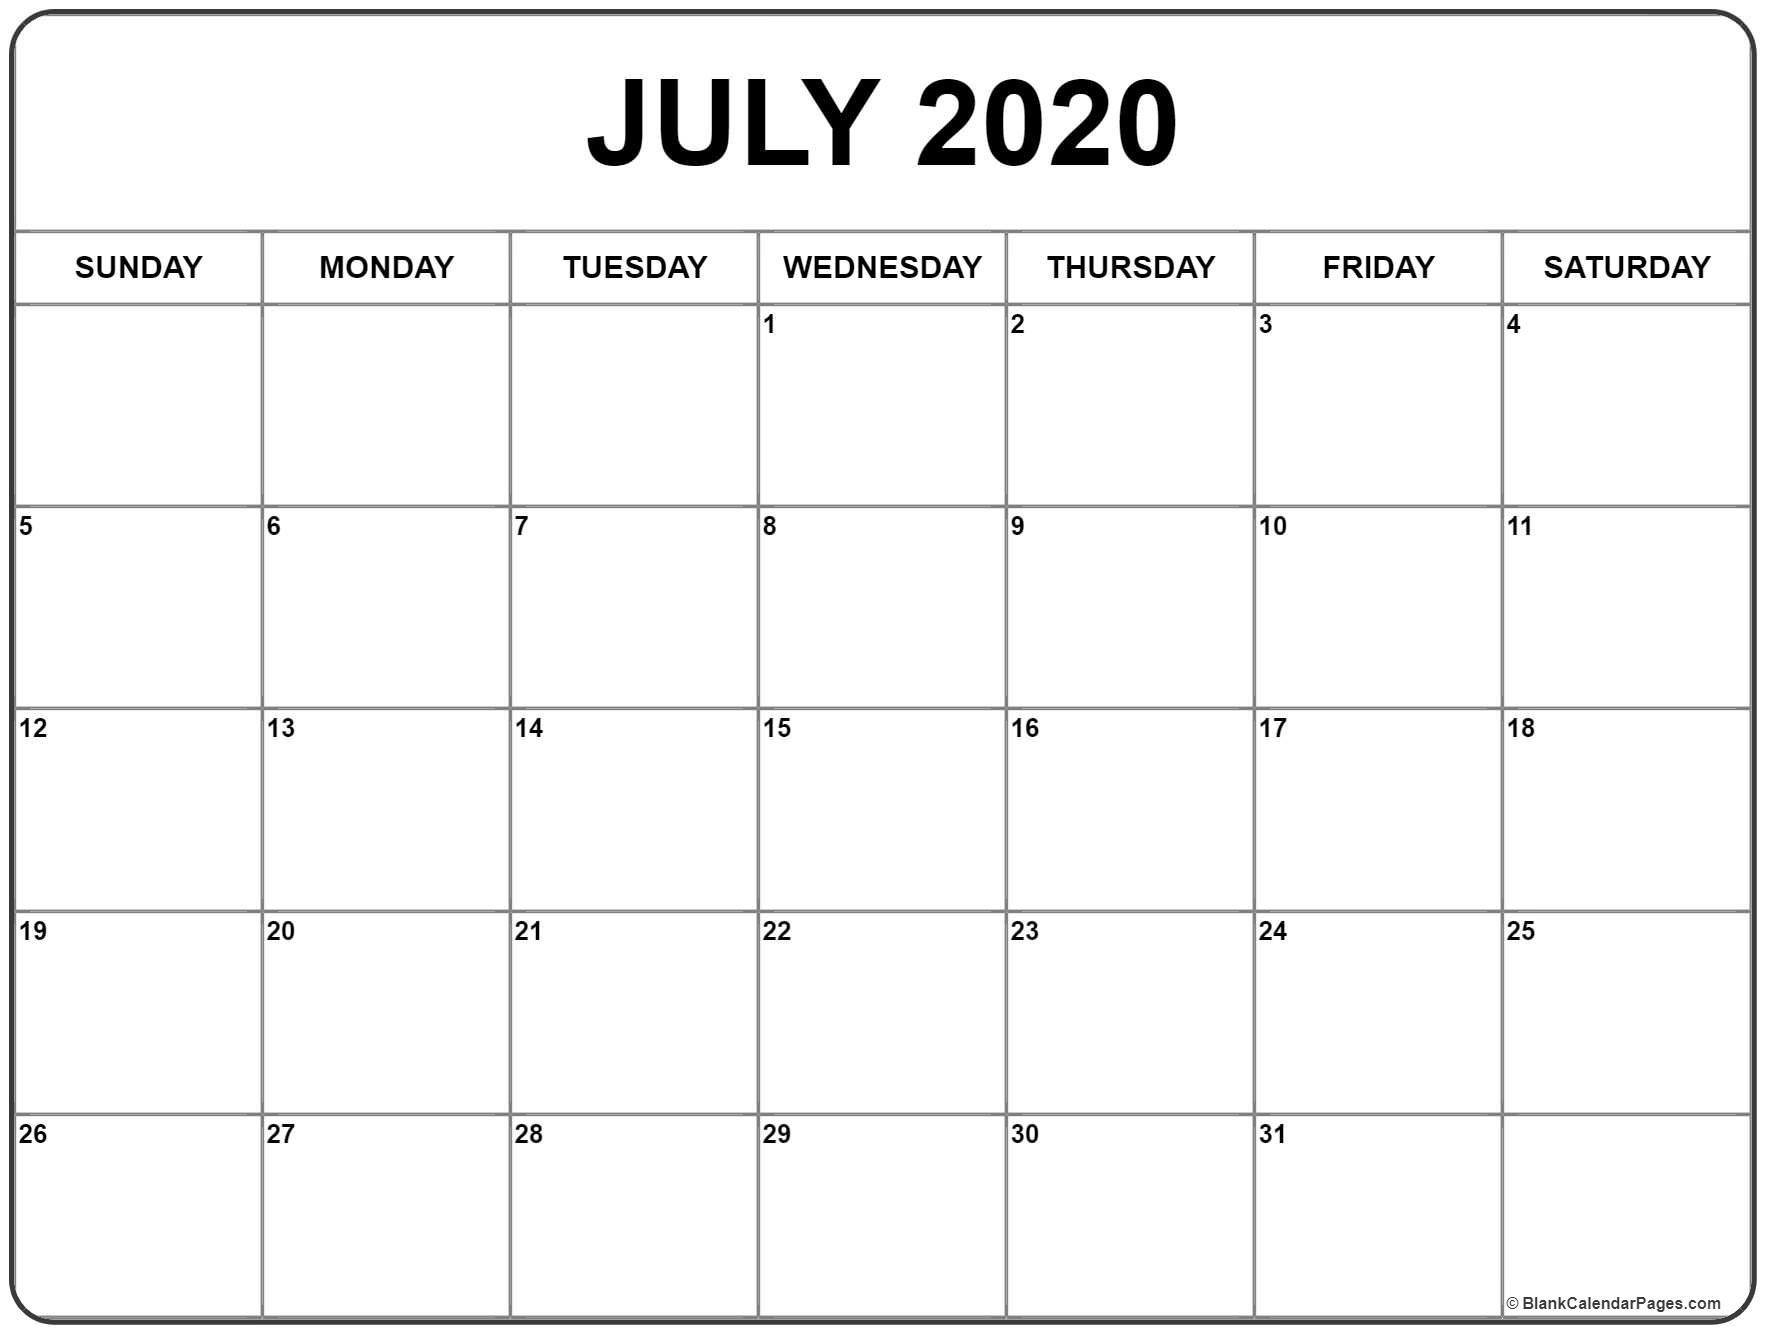 July 2020 Calendar | Printable Calendars | Printable Blank-January 2020 Calendar Canada